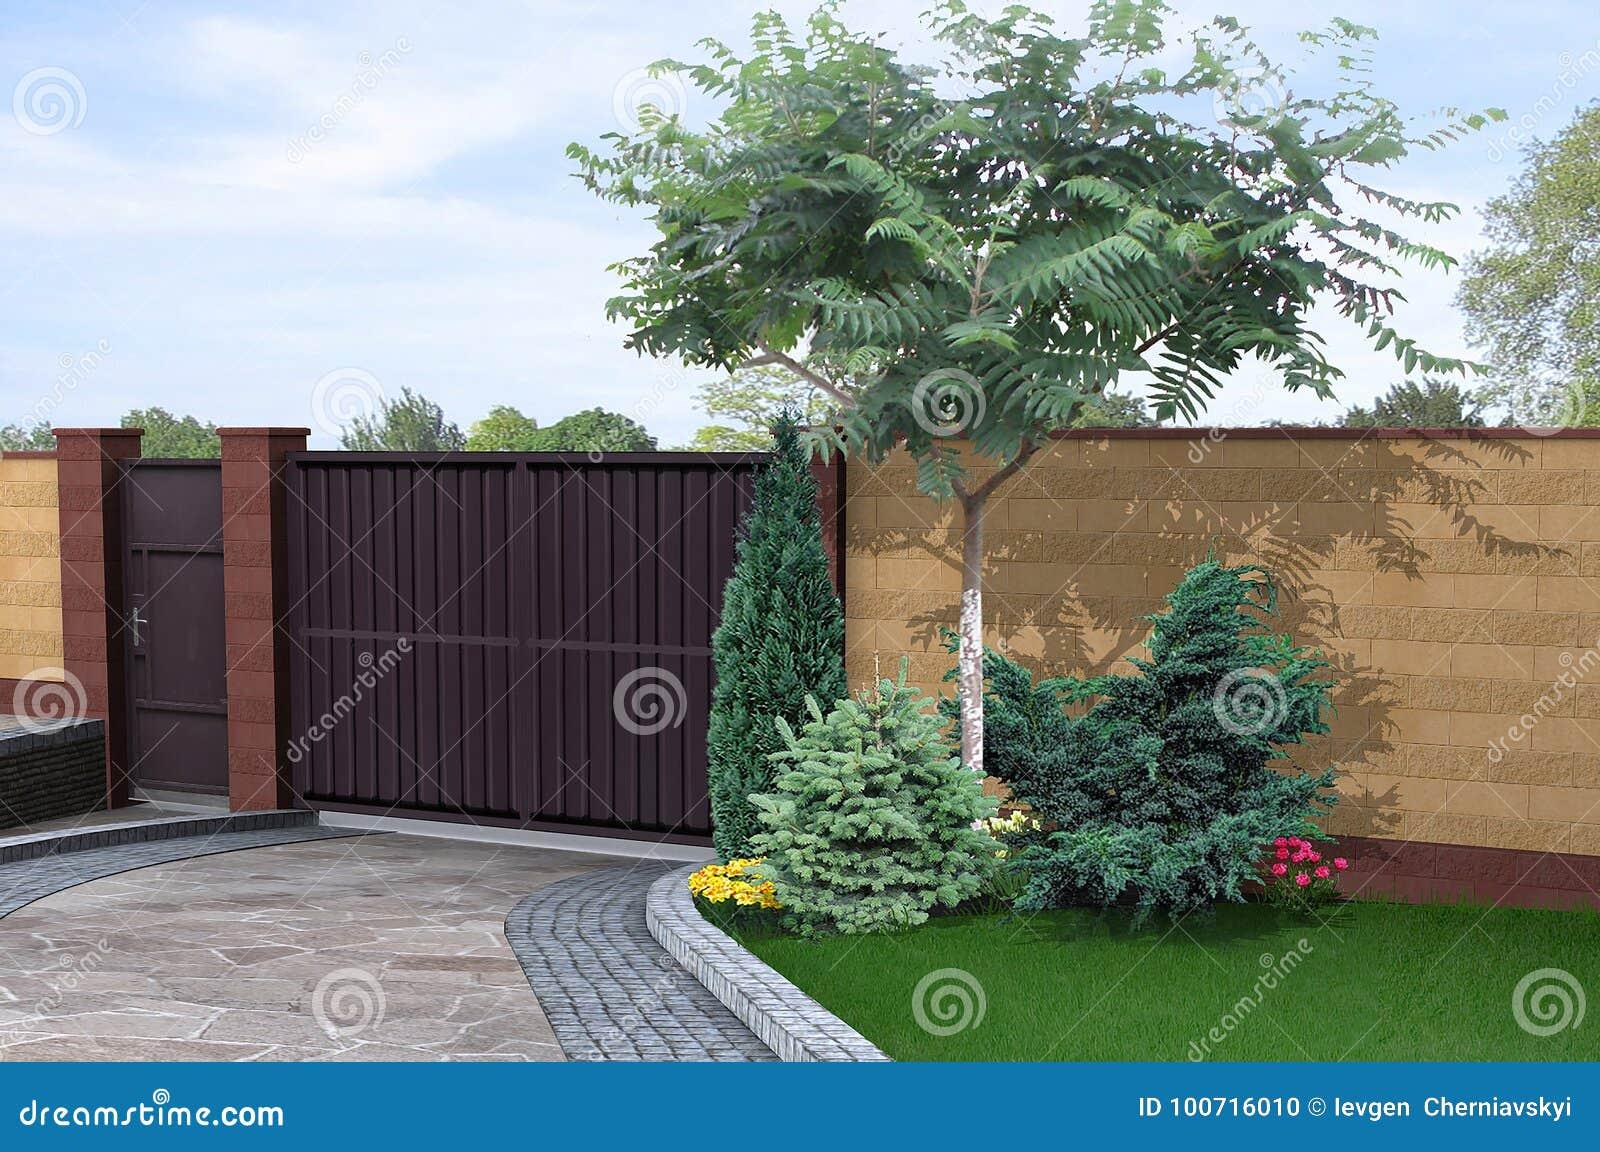 Driveway And Walled Garden Design Ideas, 3d Render Stock ...